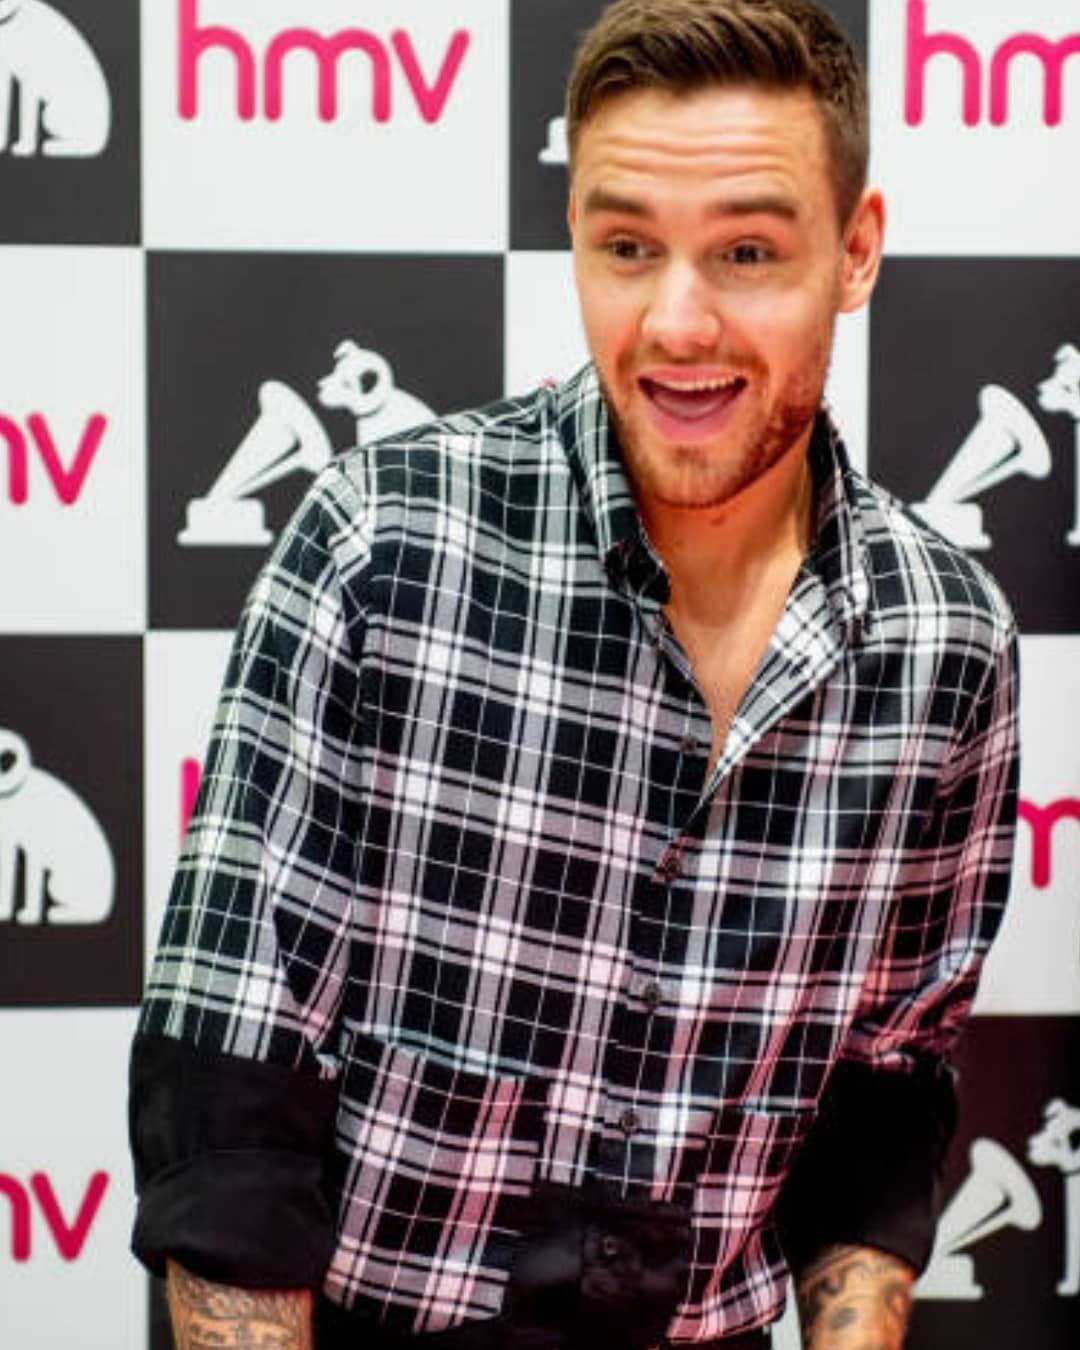 I Want To Hug Him Liamdeservestheworld Alliwantforchristmas Lp1 Stackitup Familiar Stripthatdown Foryou Getlow Liam Payne Liam James Men Casual